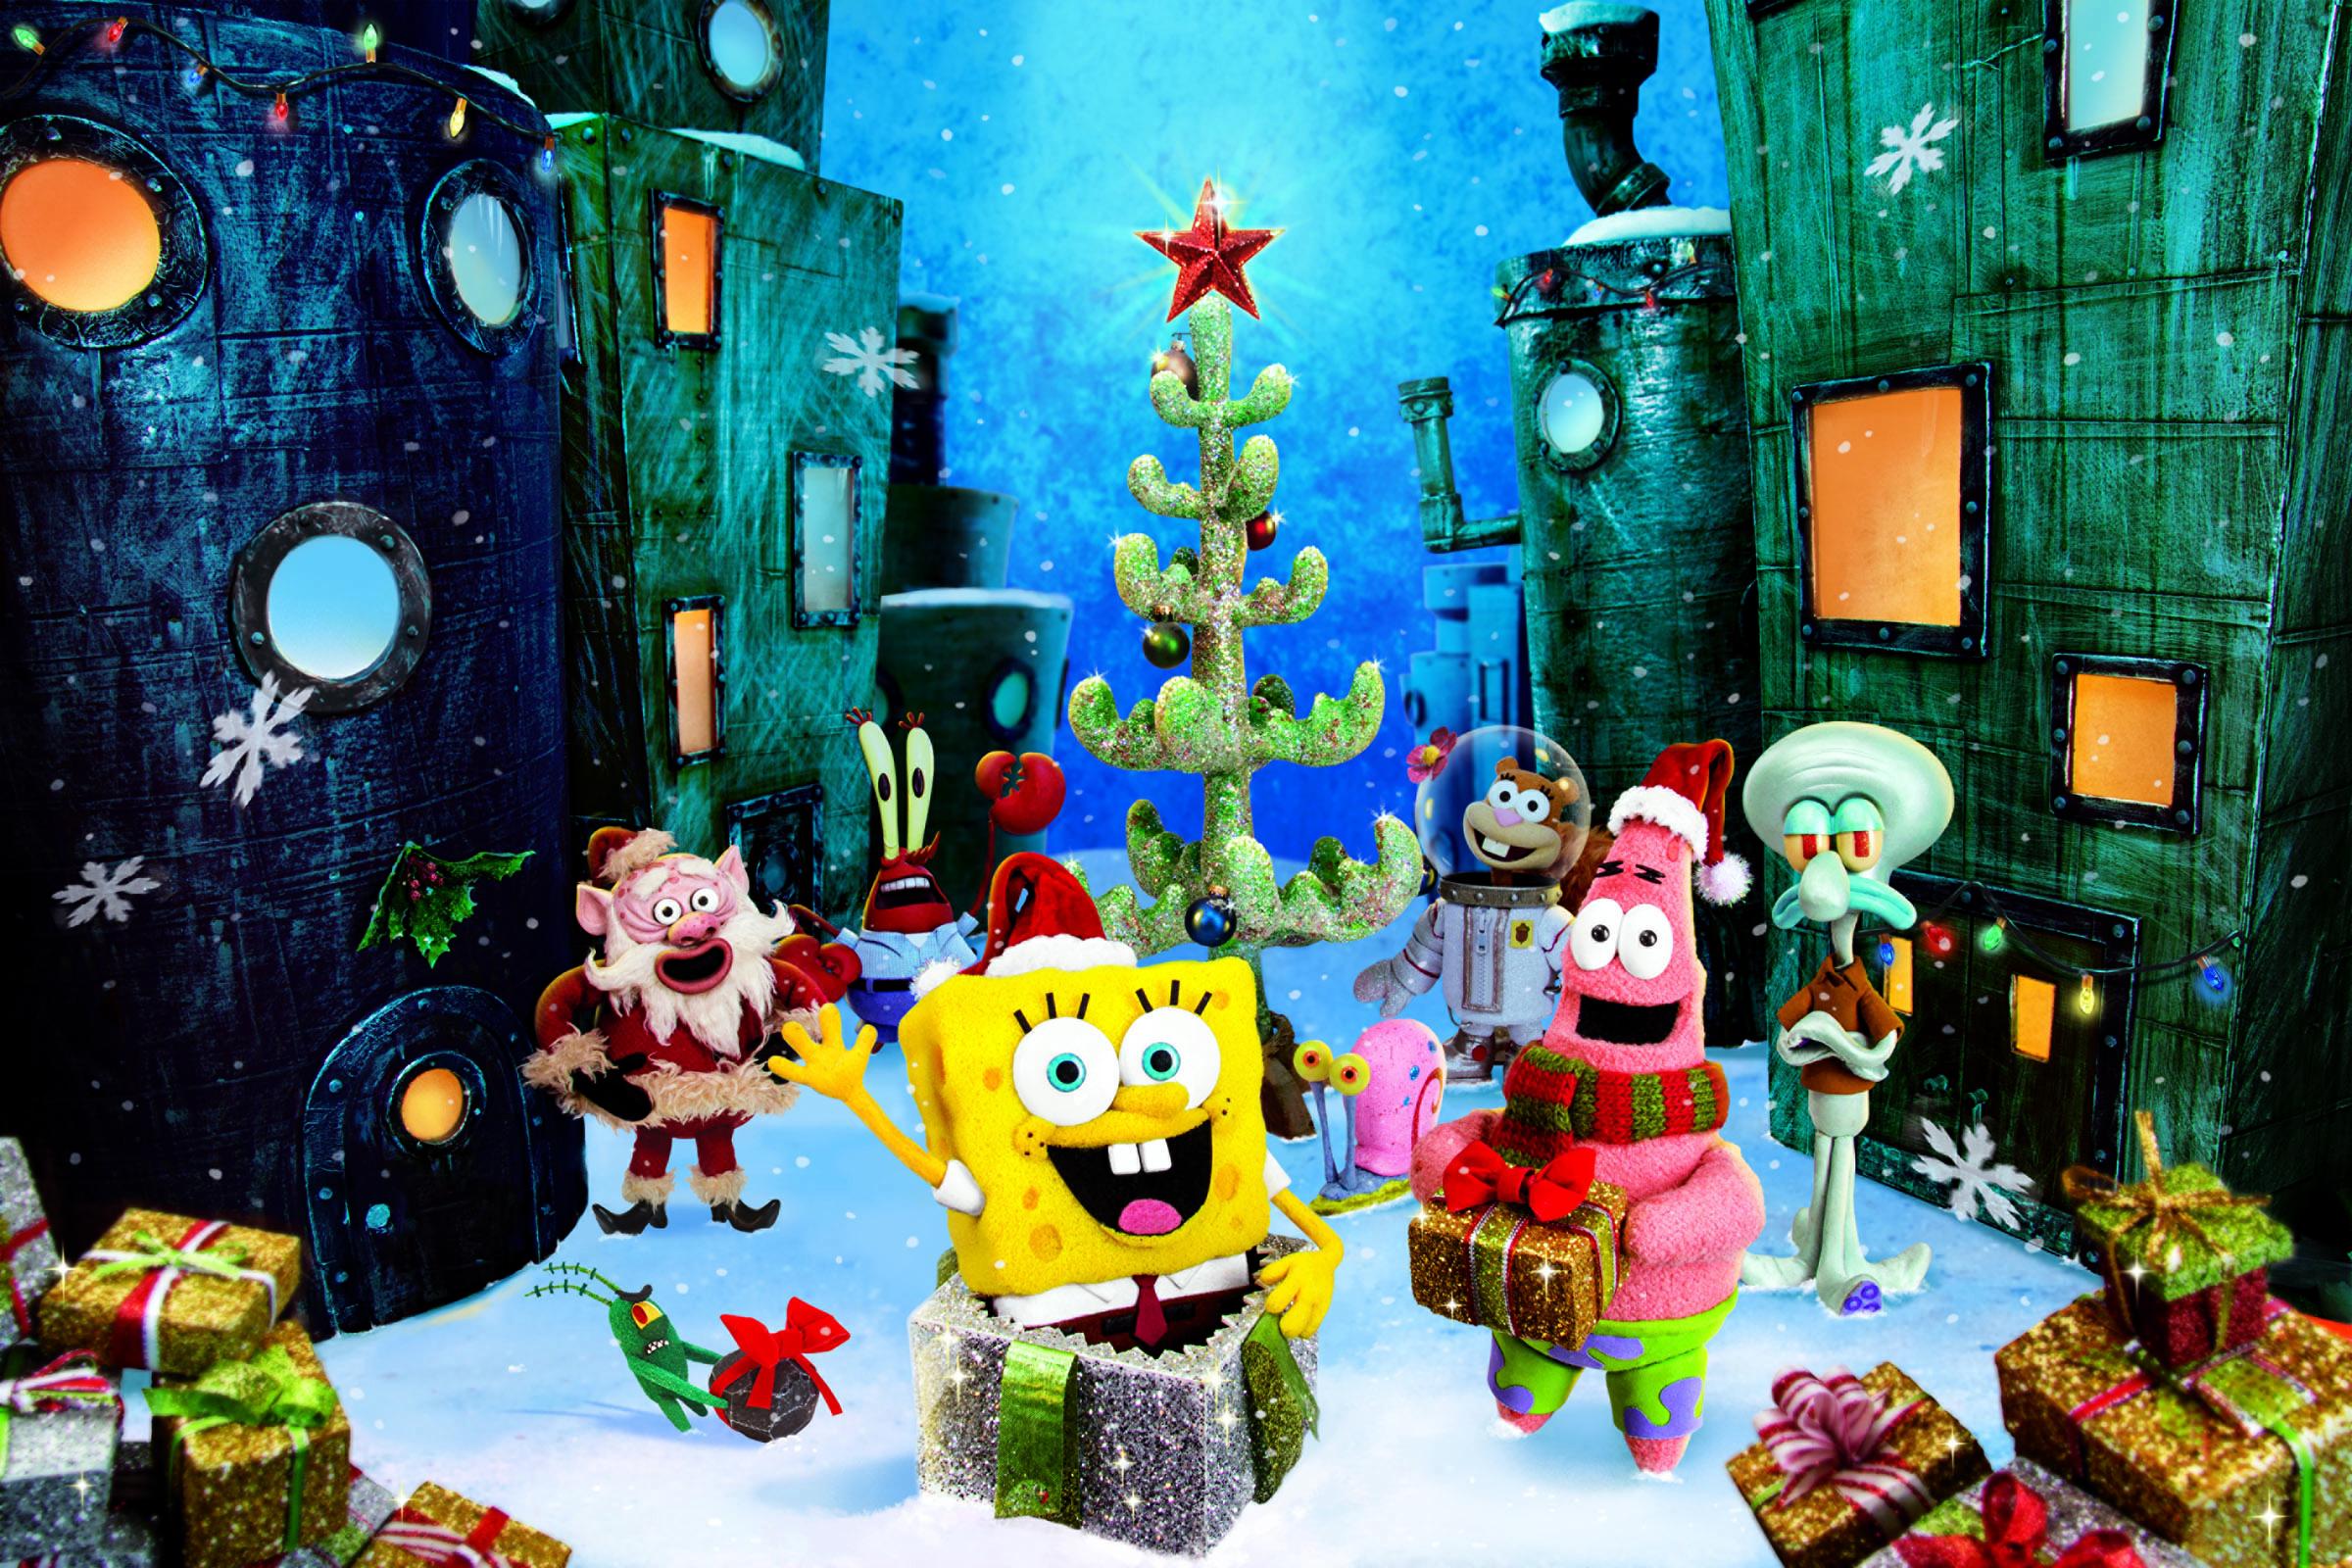 spongebob squarepants its a spongebob christmas tv episode 2012 photo gallery imdb - Spongebob Christmas Who